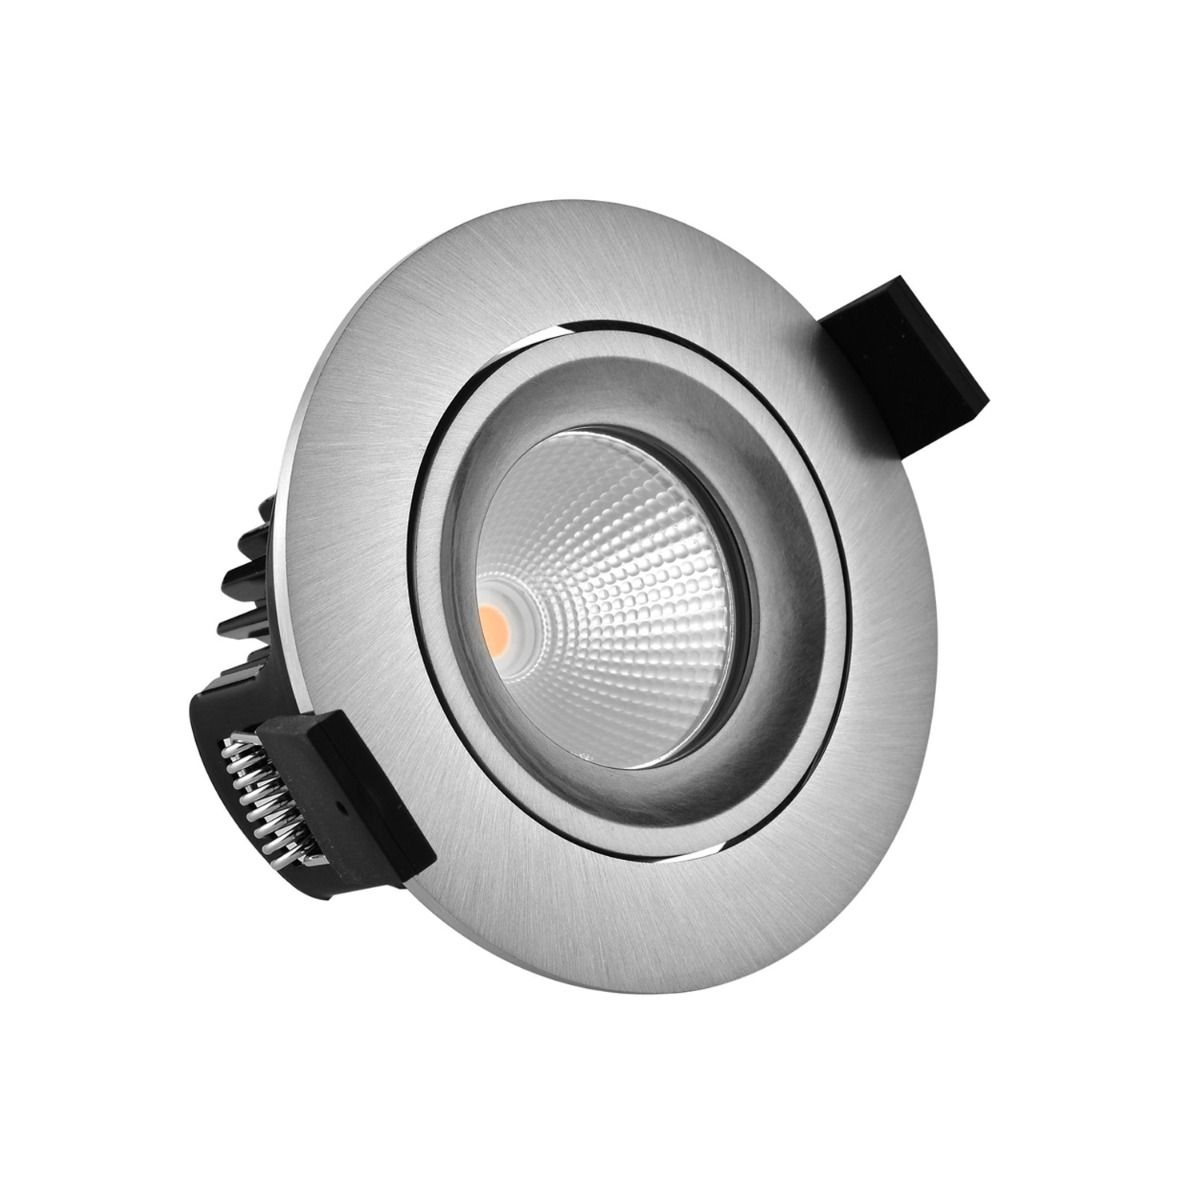 Noxion LED-Spot Hydro IP65 Fireproof Aluminium 2700K 6W | Höchste Farbwiedergabe - Dimmbar